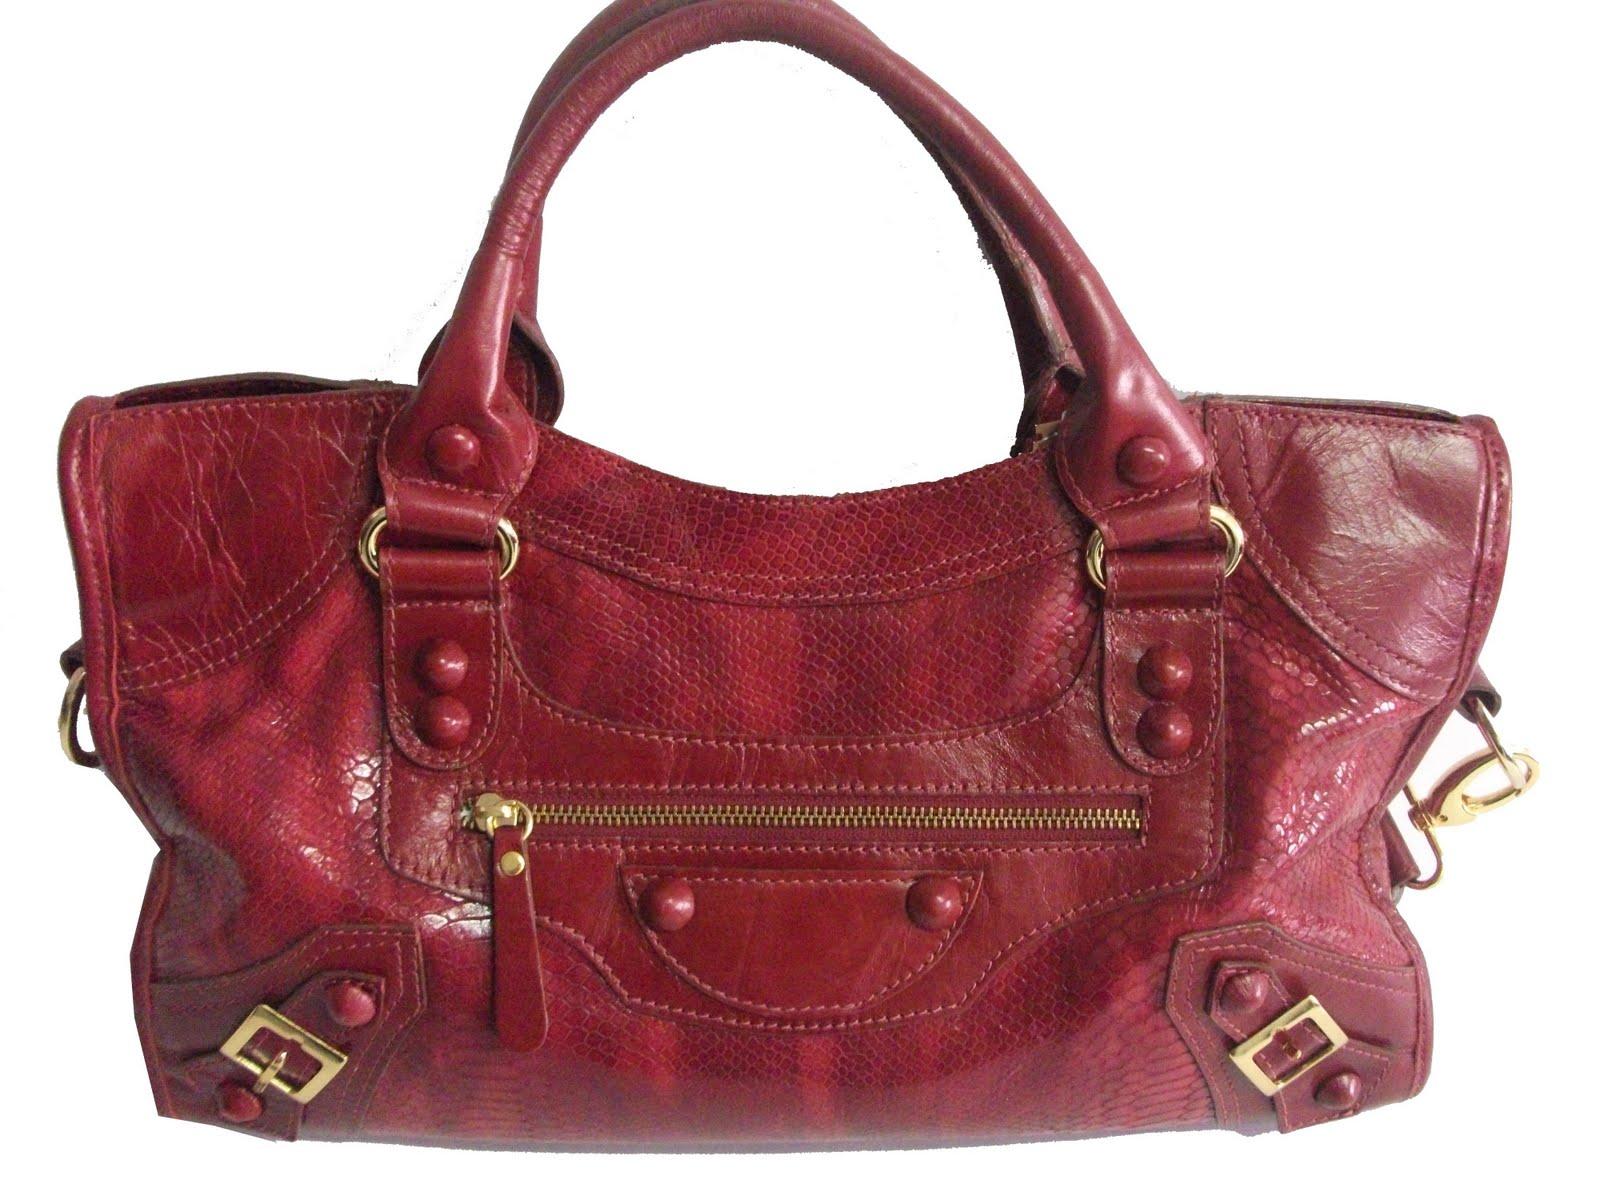 Bolsa De Couro Usada : Bolsa de couro feminina moda e qualidade modelos